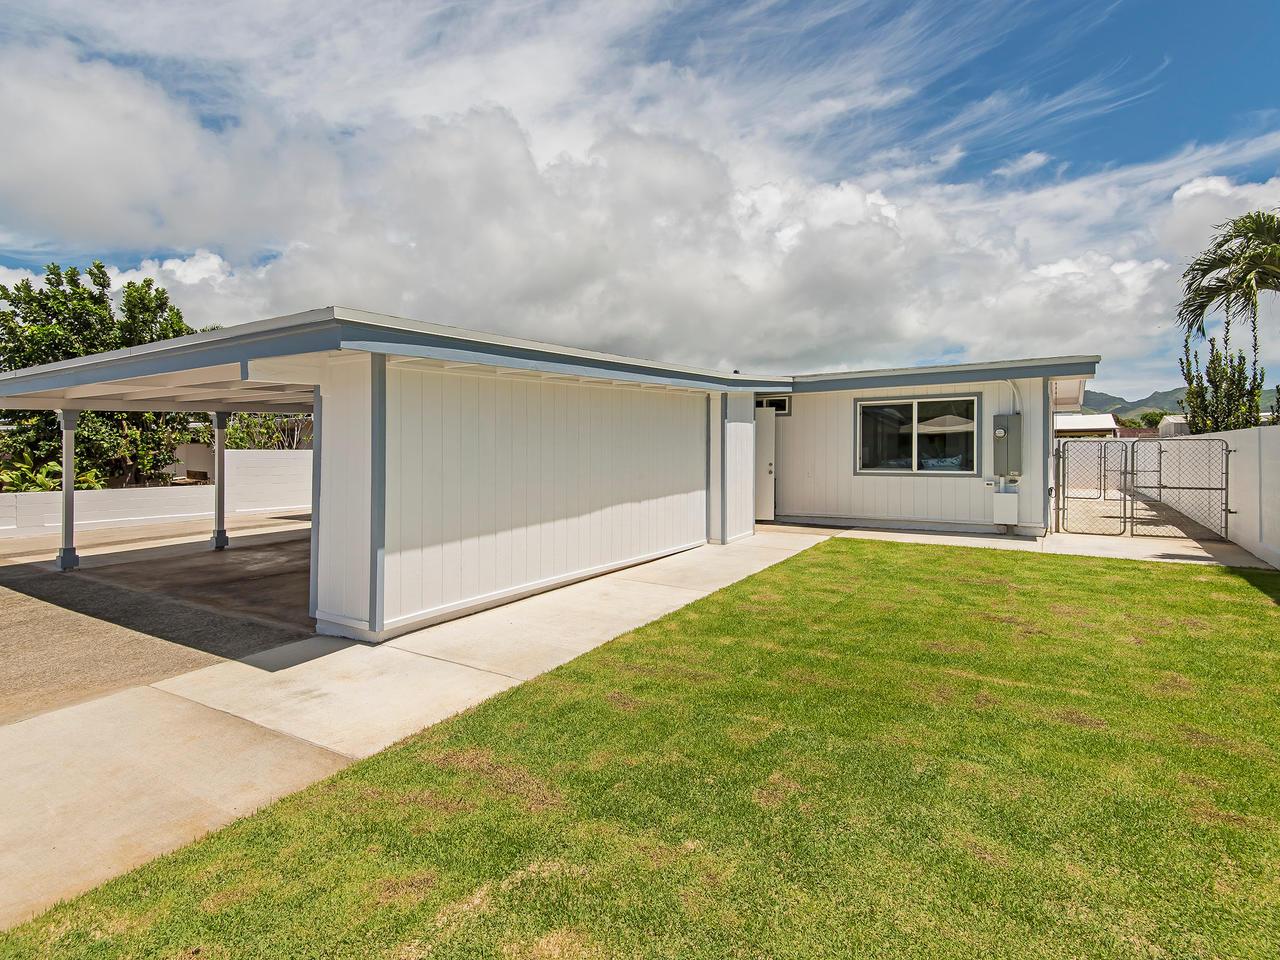 Oahu Real Estate News